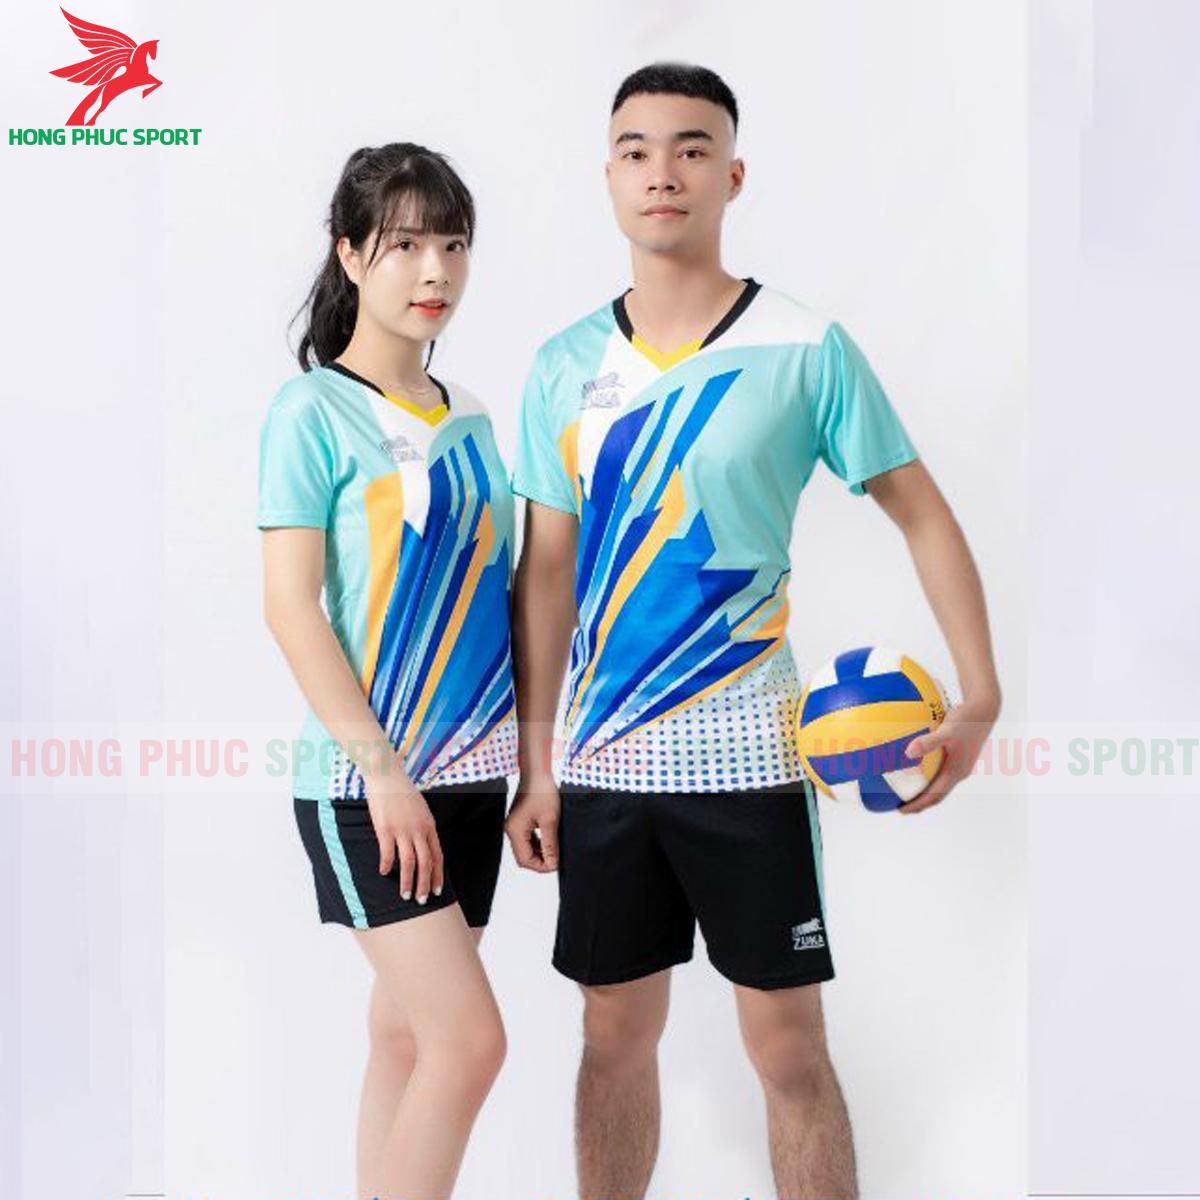 https://cdn.hongphucsport.com/unsafe/s4.shopbay.vn/files/285/quan-ao-bong-chuyen-zuka-01-2021-mau-xanh-ngoc-2-60750d629ad9a.png